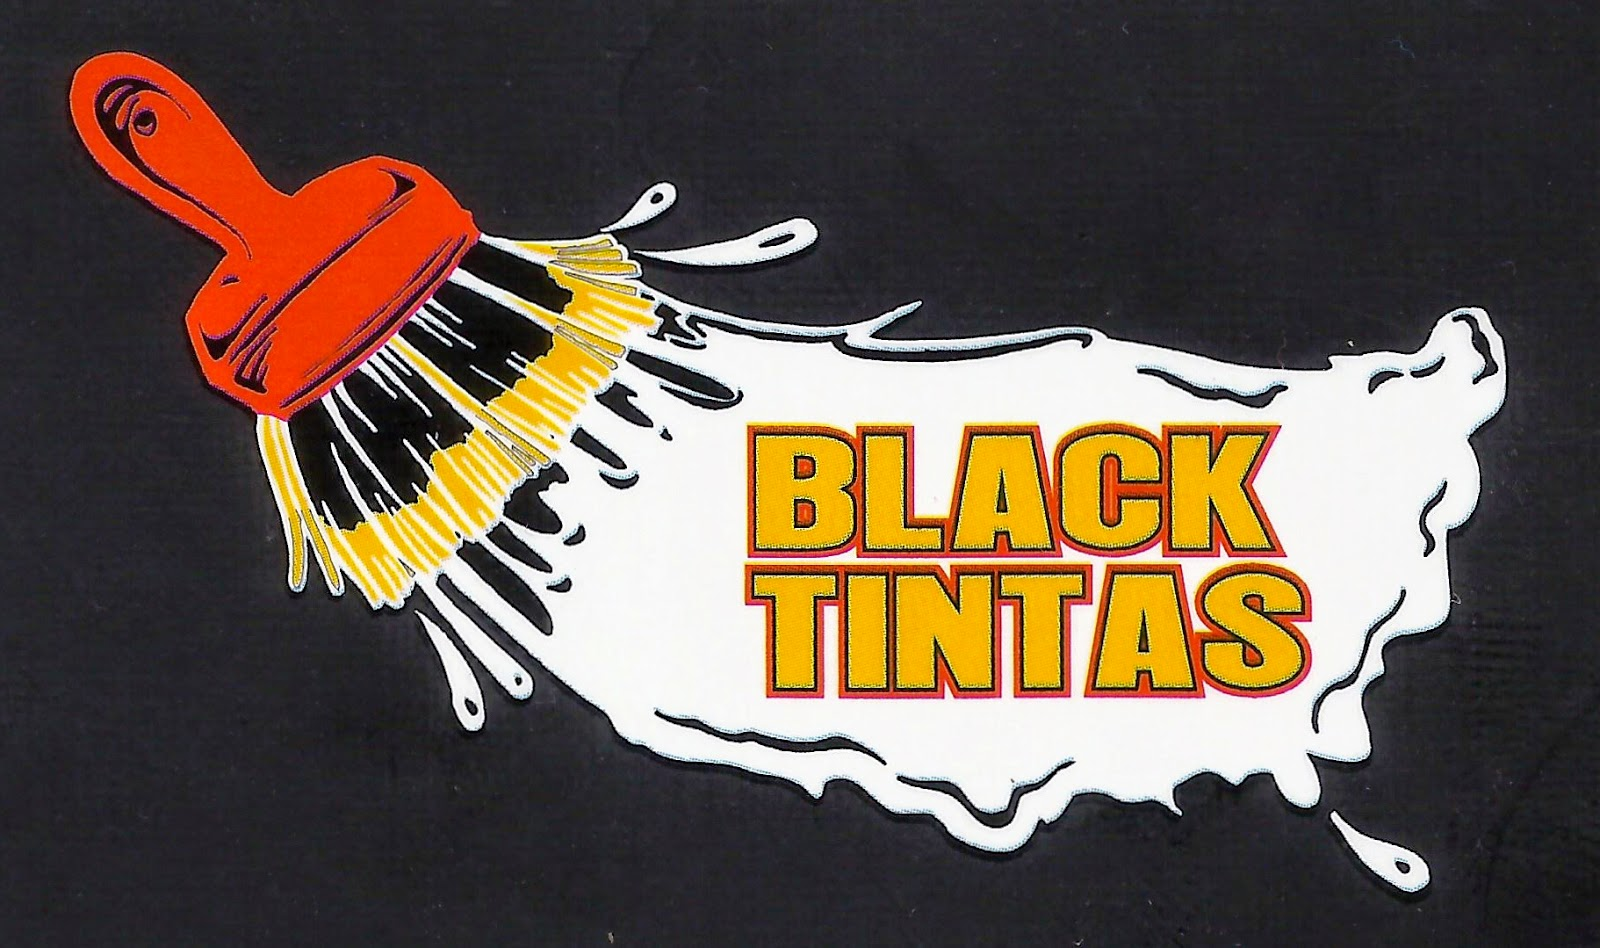 BLACK TINTAS Rua. Cel. Ernesto Piedade, 461 Centro - Sarapuí - SP e-mail: blacktintas@gmail.com tel: (15) 3276-1188 / 99715-3935